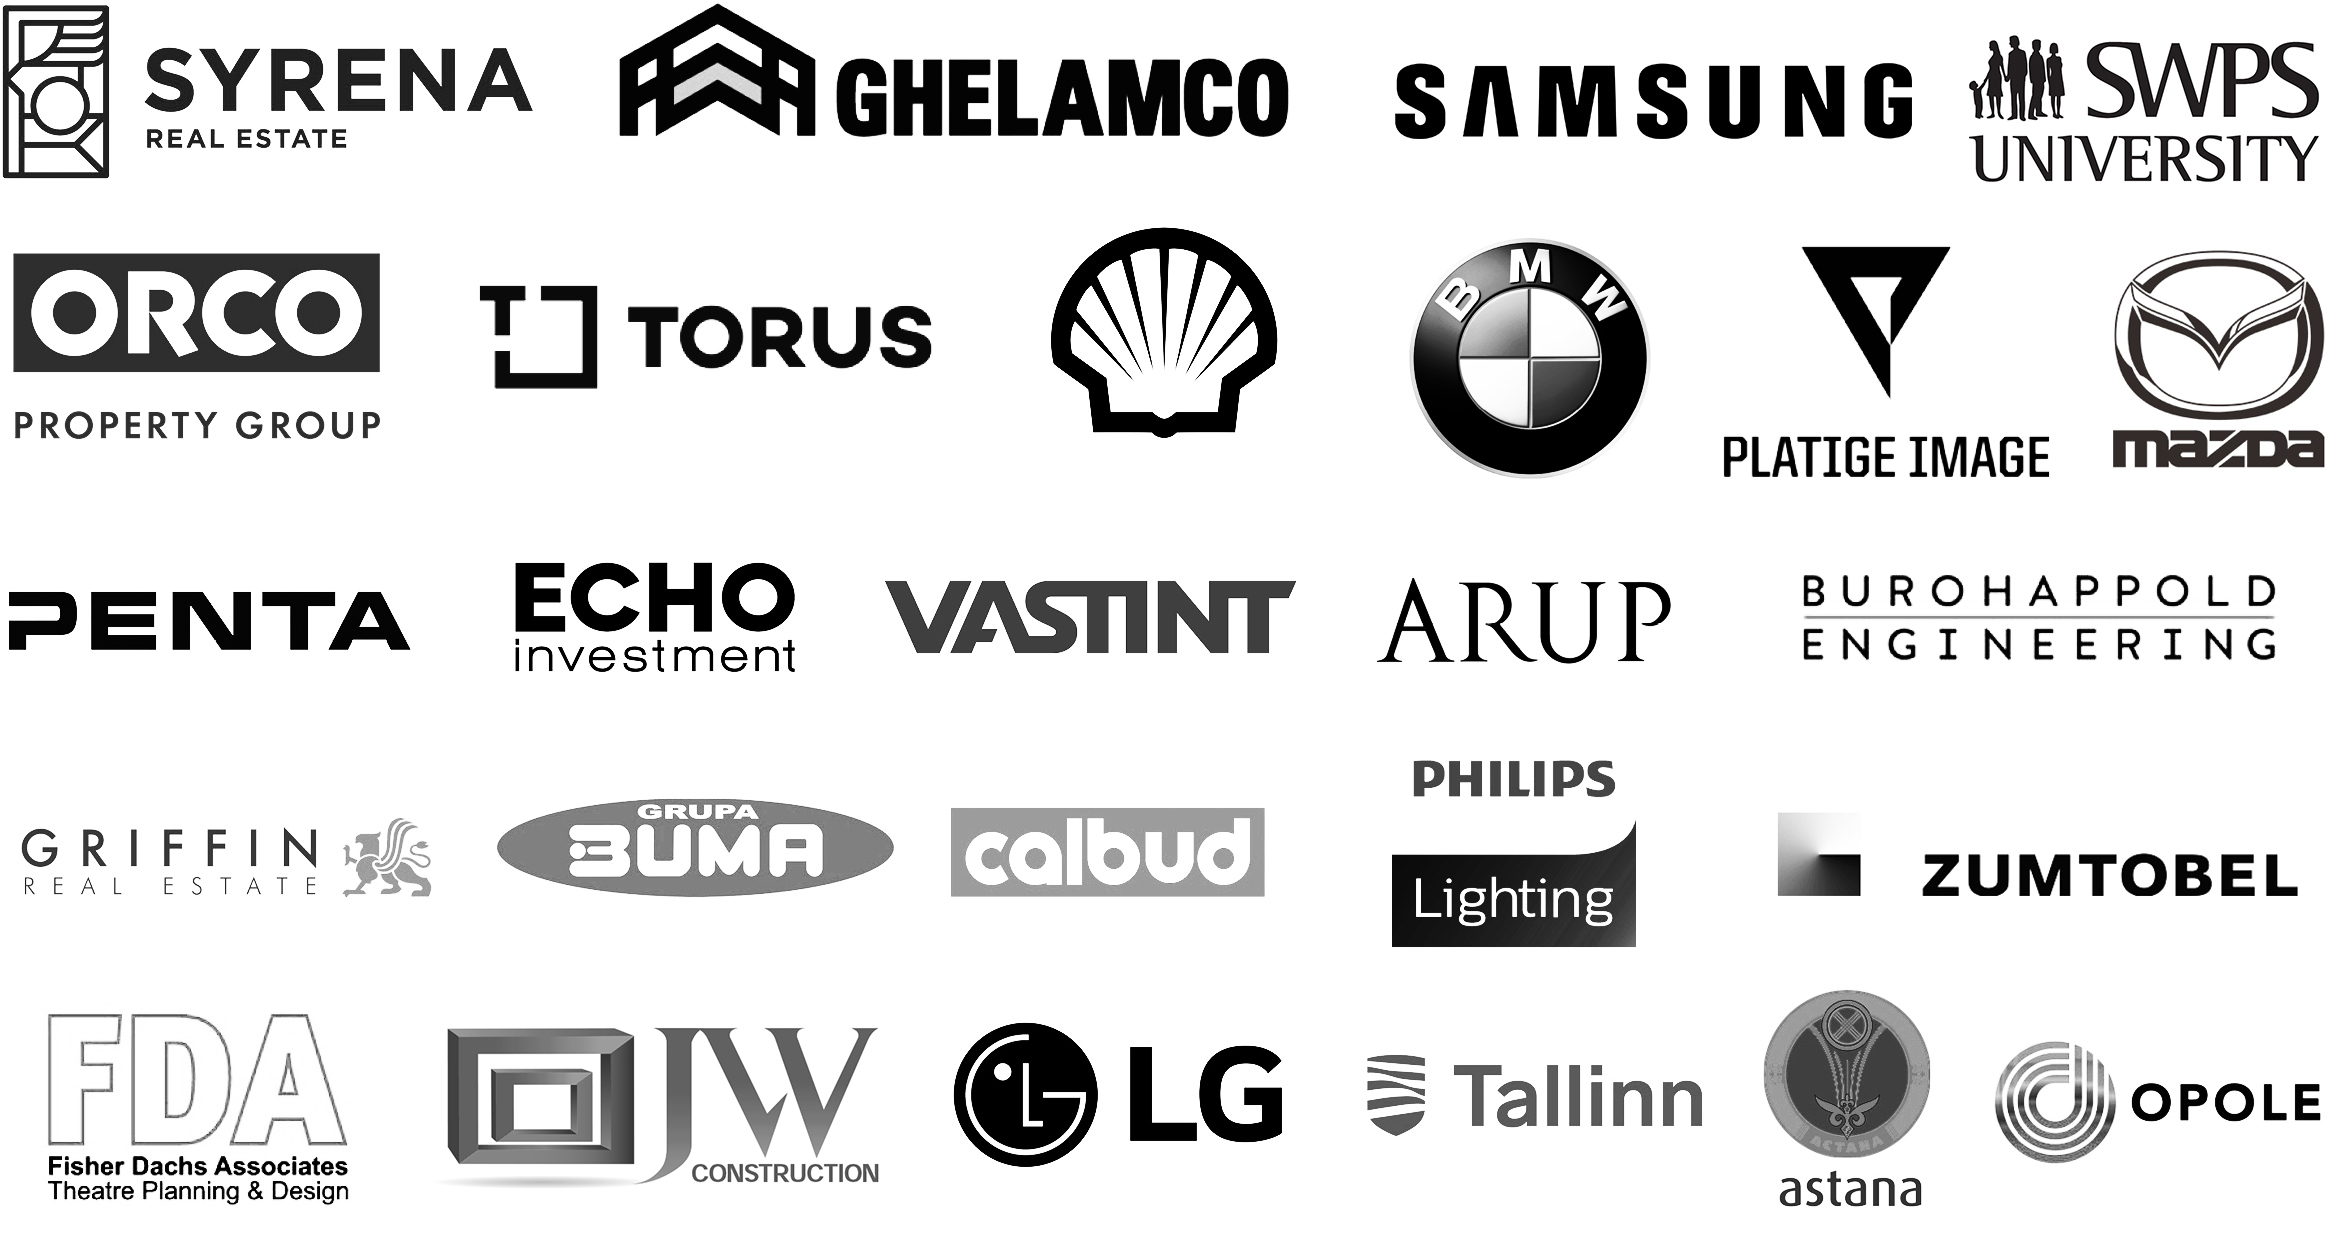 MJZ_CLIENTSCONSULTANTS_logos-horizontal2022